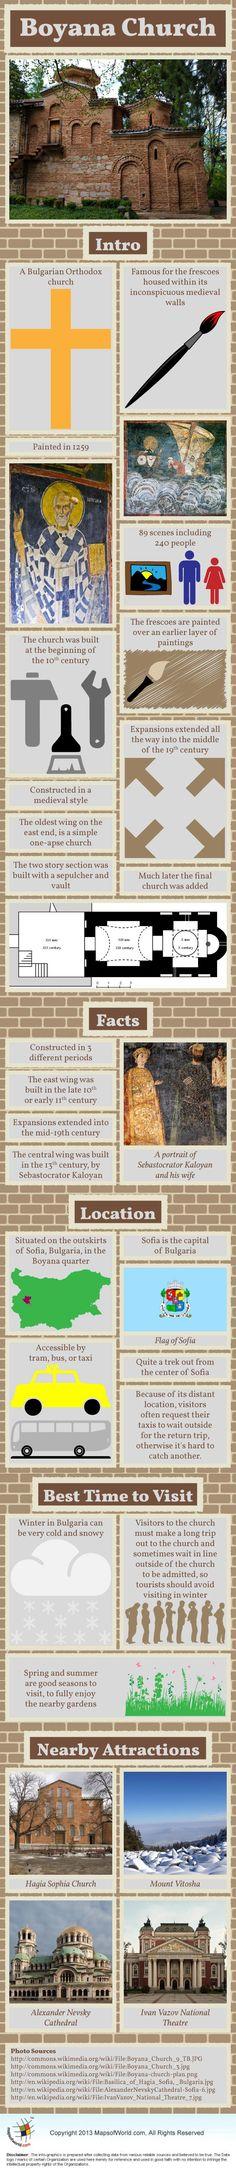 Boyana Church Infographic – Facts about Boyana Church in Sofia, Bulgaria.